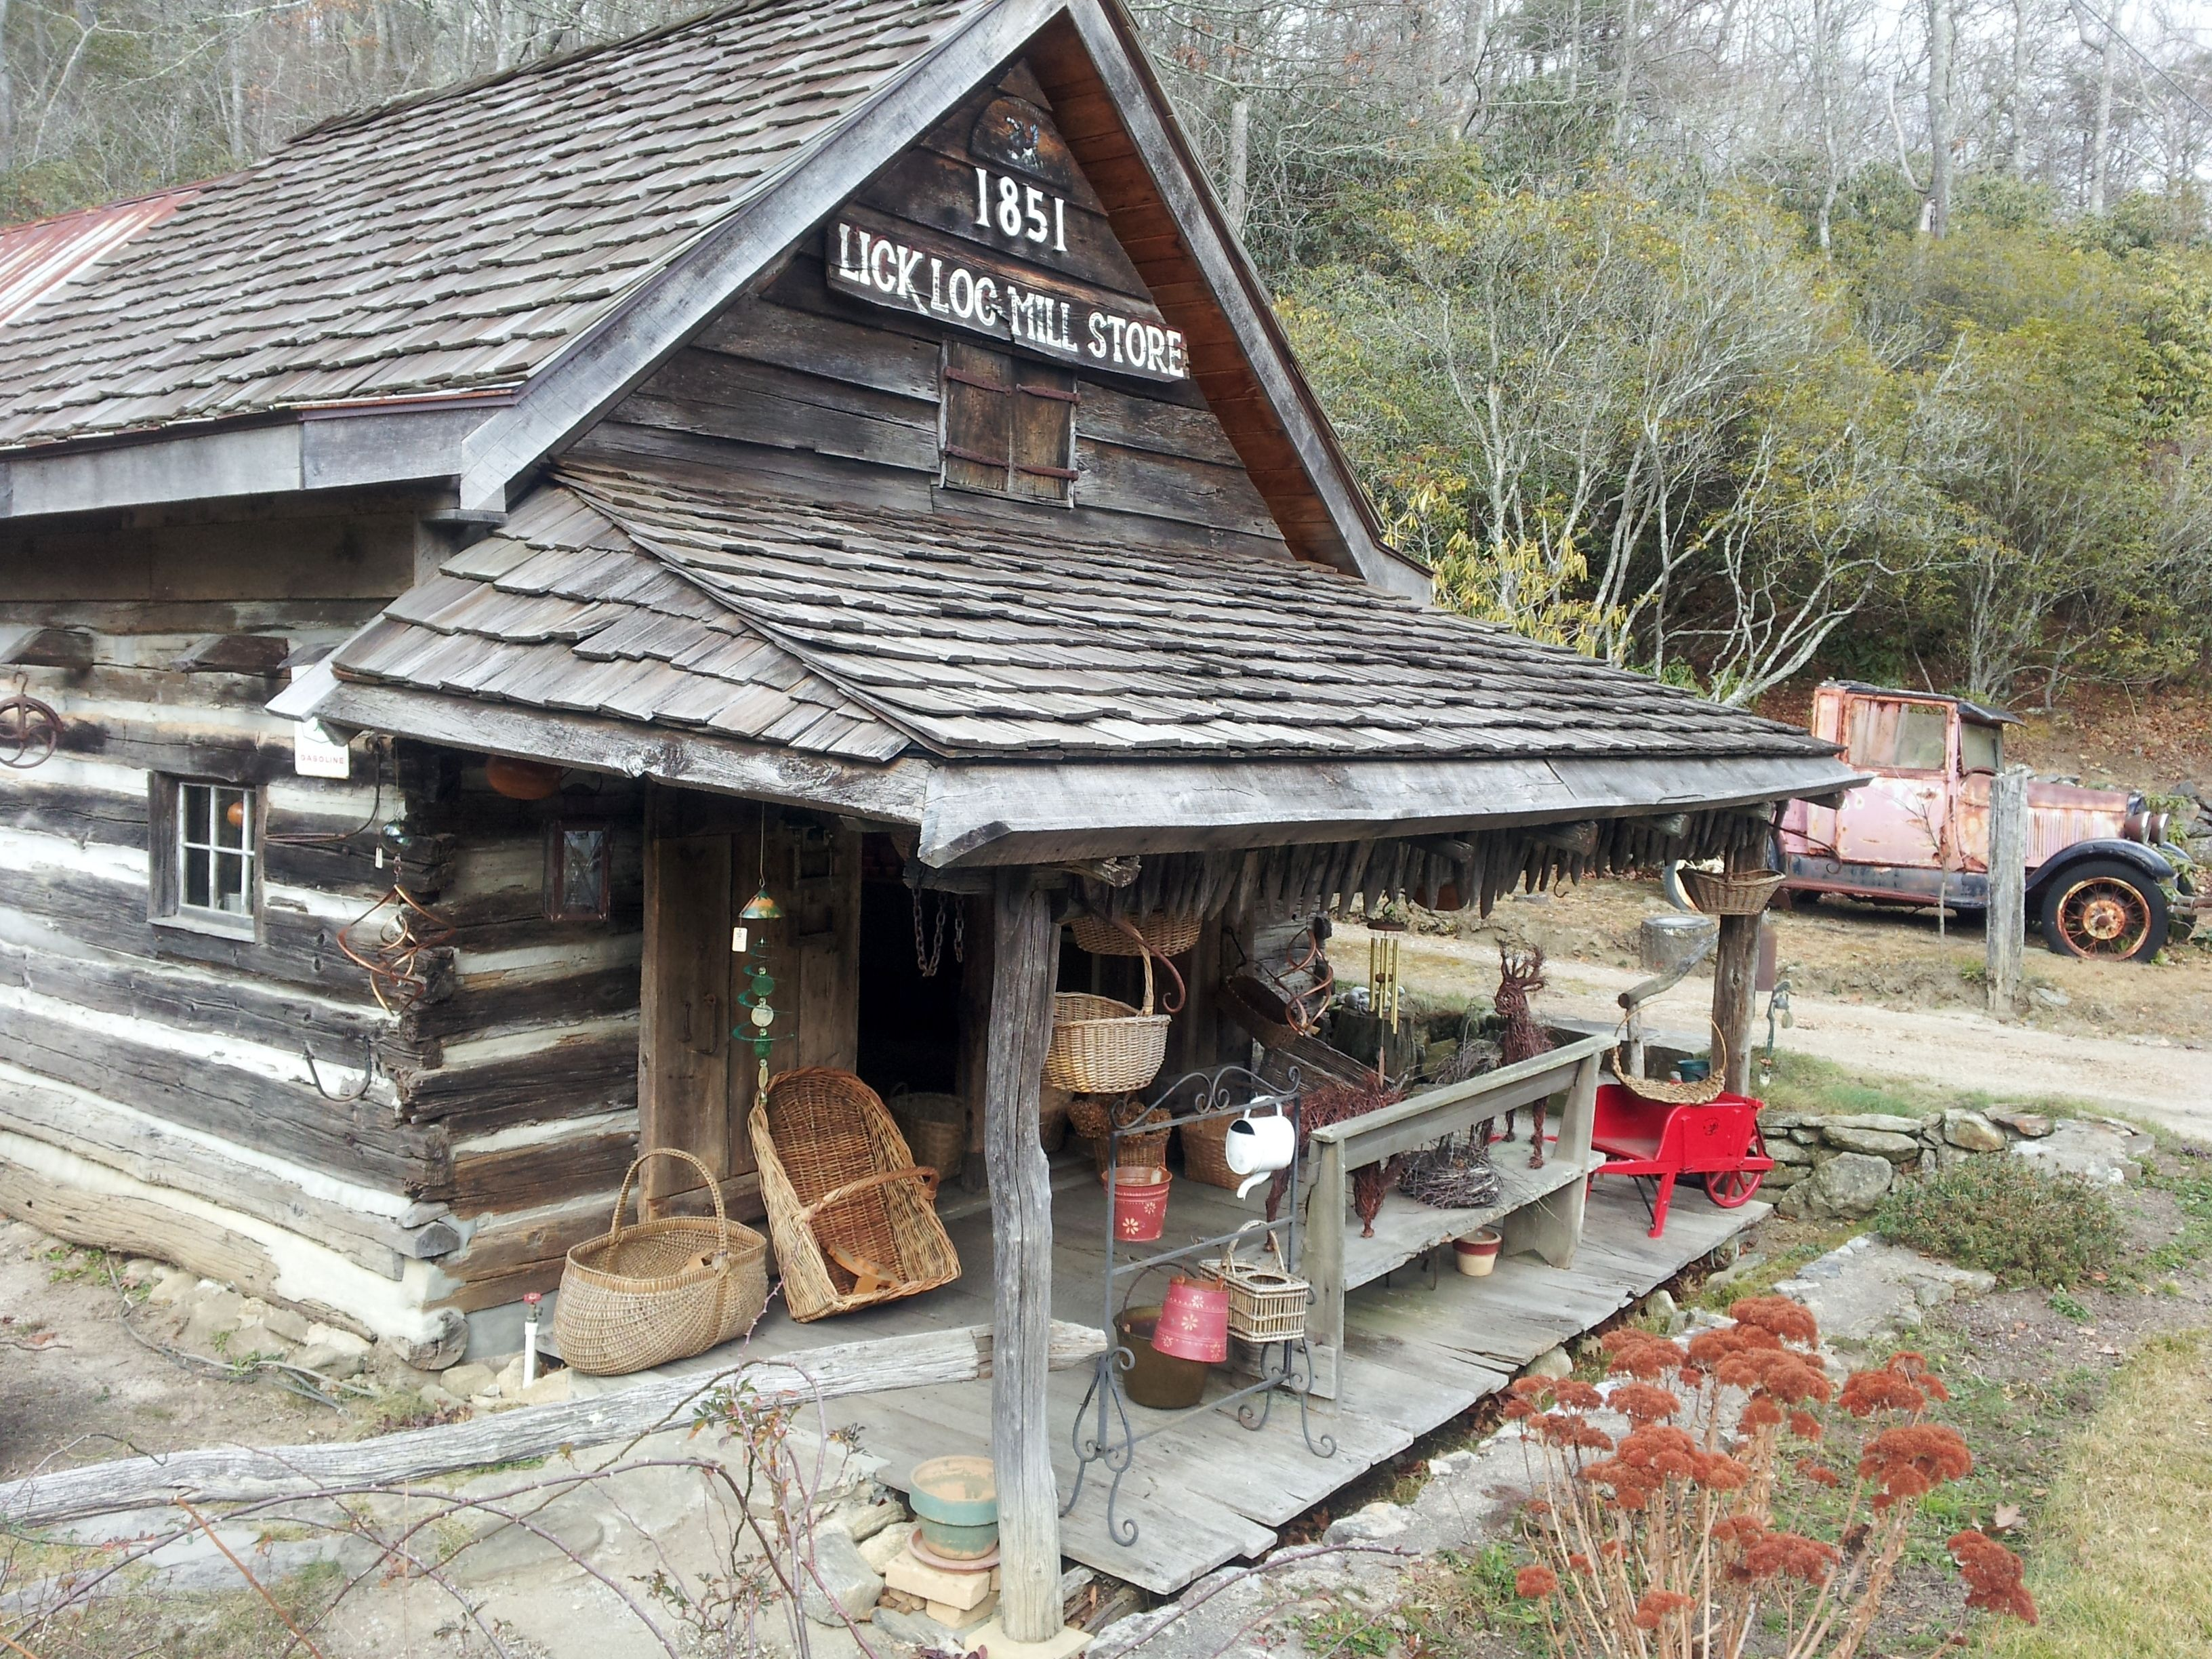 Lick log mill store